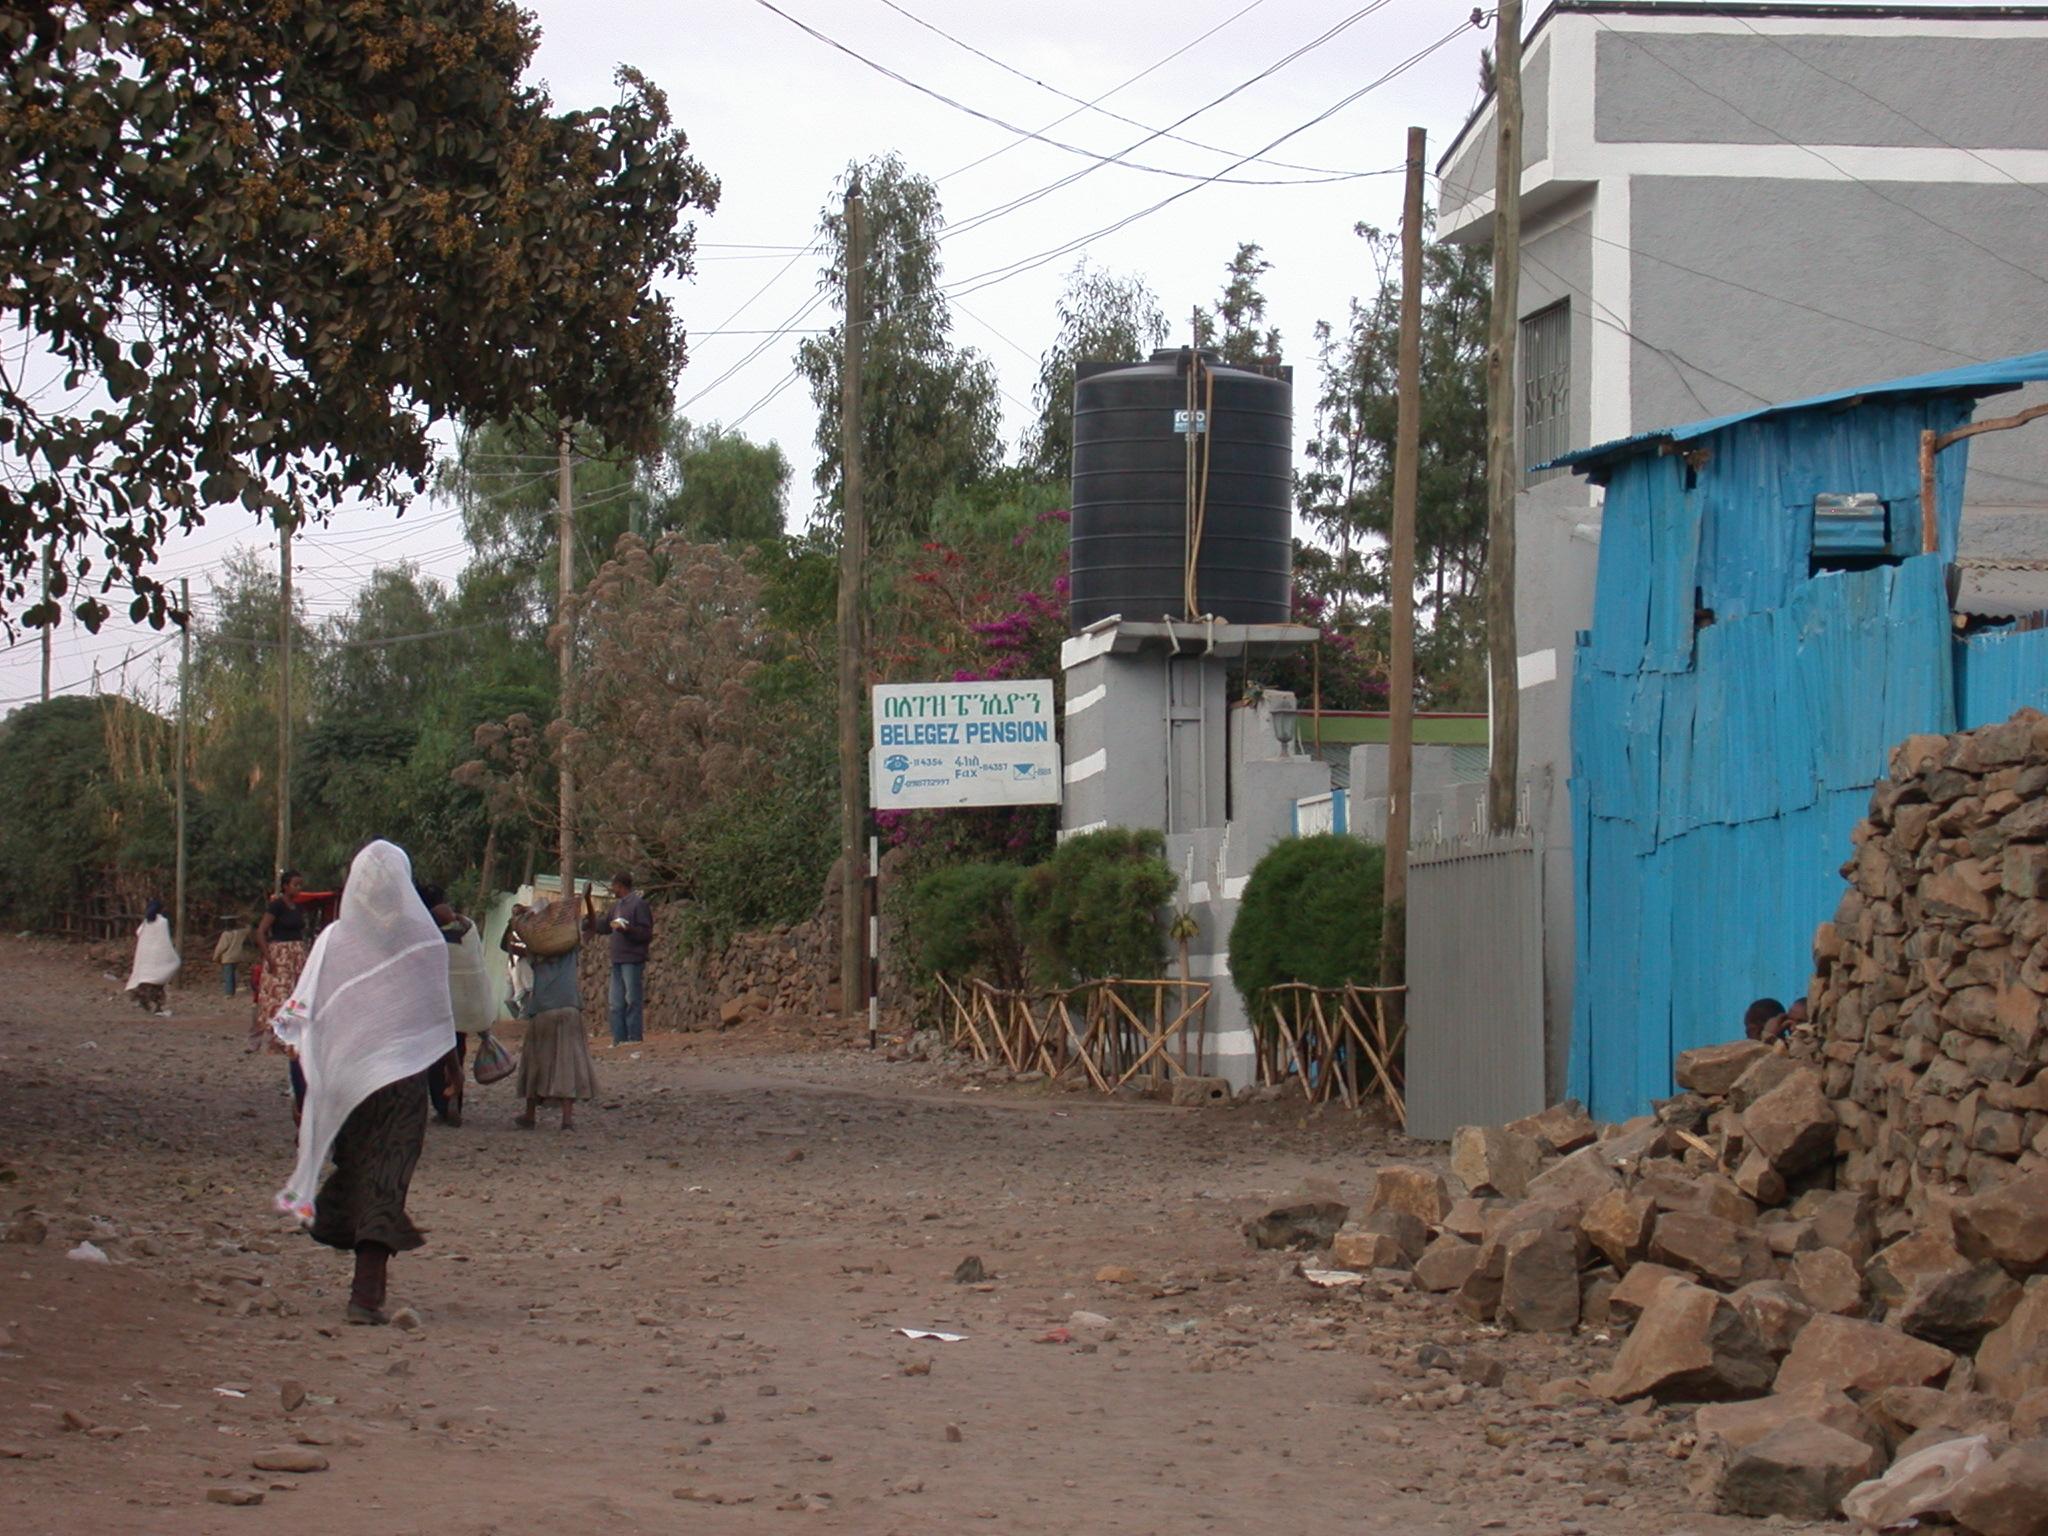 Belegez Pension, Gonder, Ethiopia